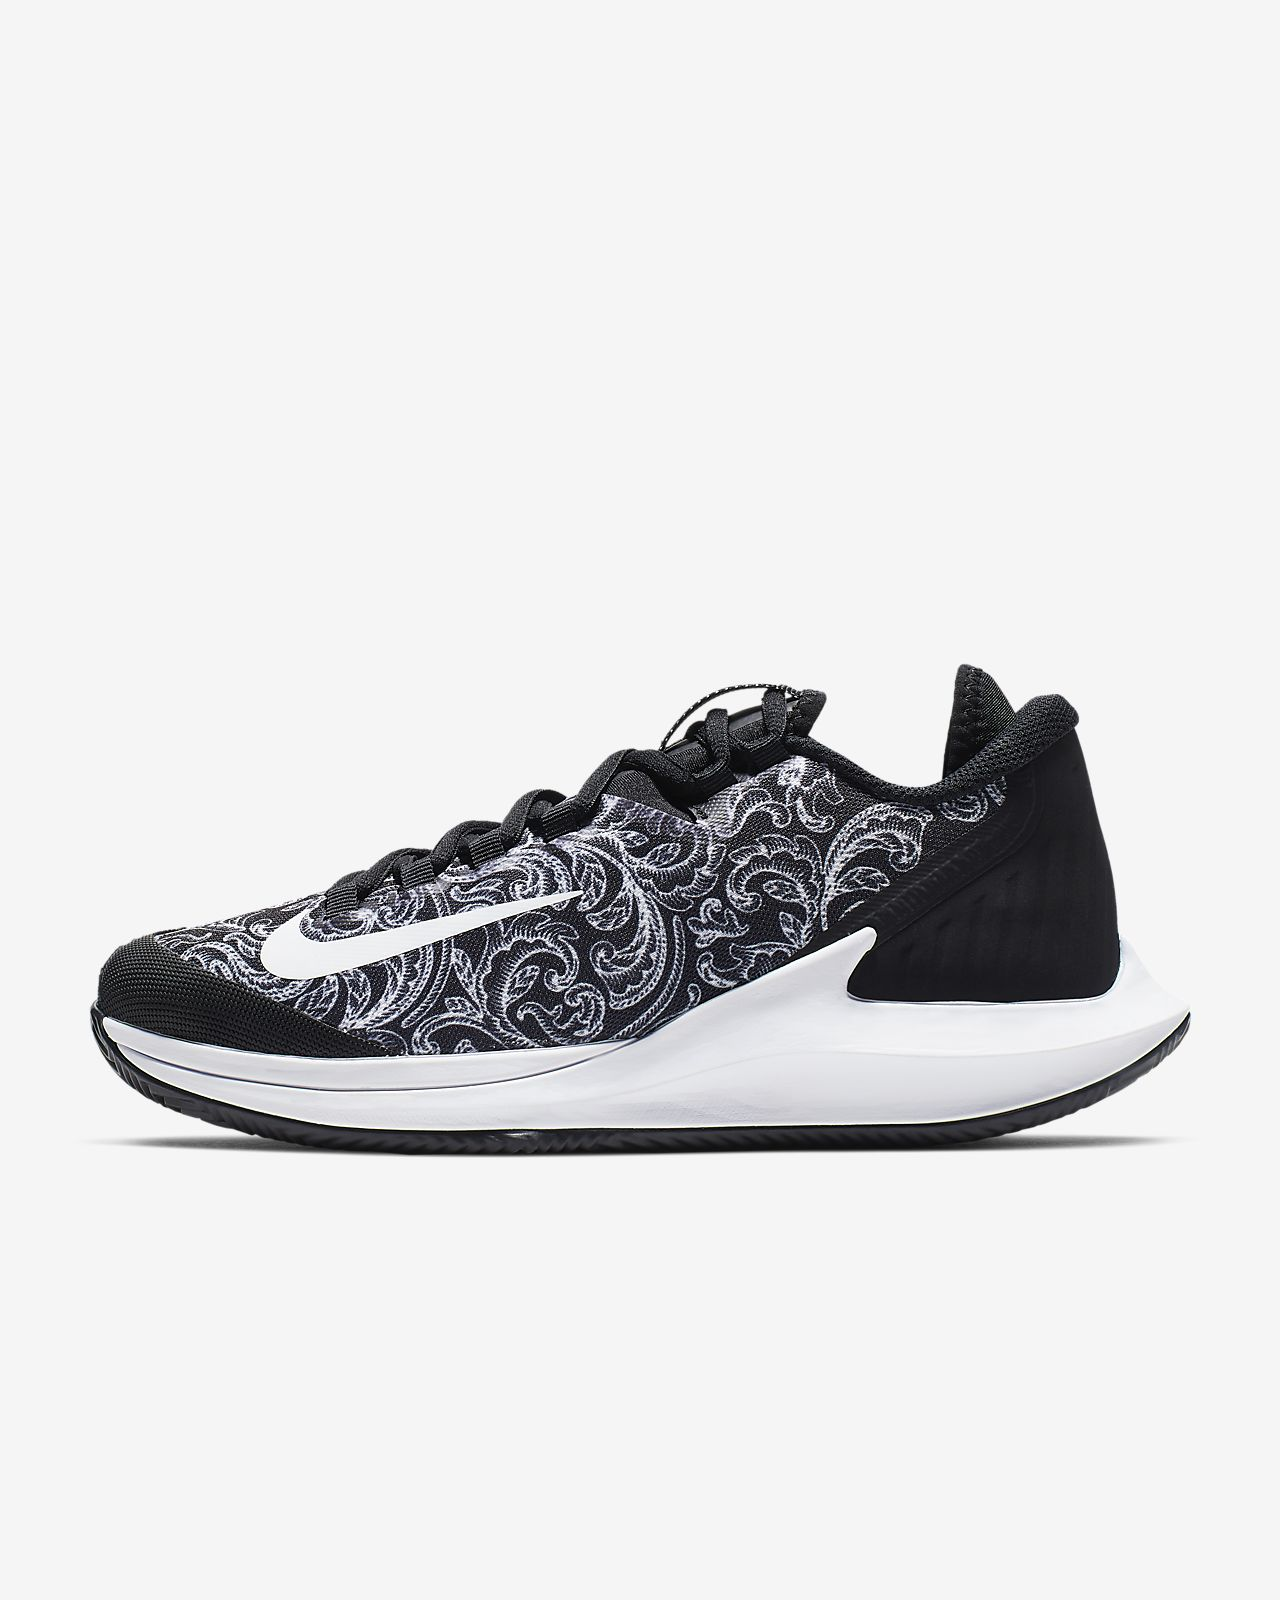 NikeCourt Air Zoom Zero Women's Clay Tennis Shoe